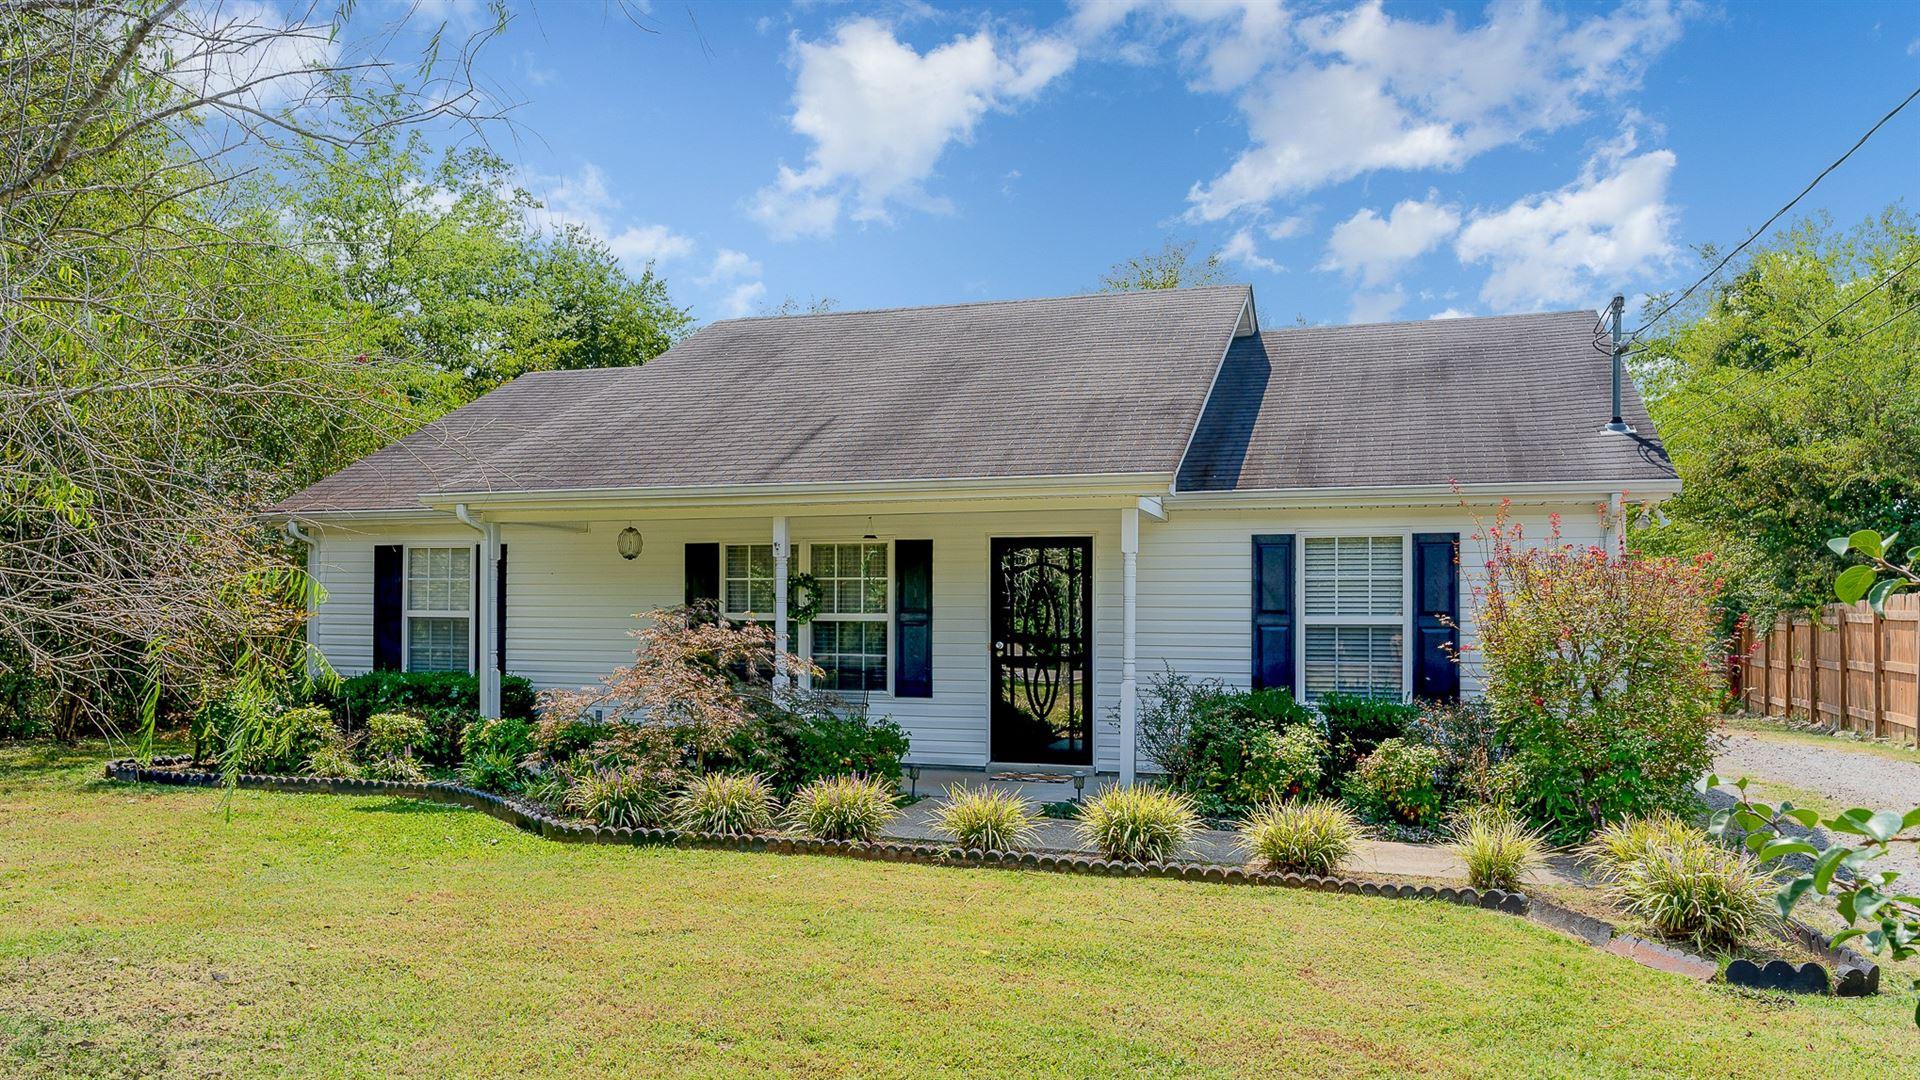 1559 Ringwald Rd, Murfreesboro, TN 37130 - MLS#: 2285834